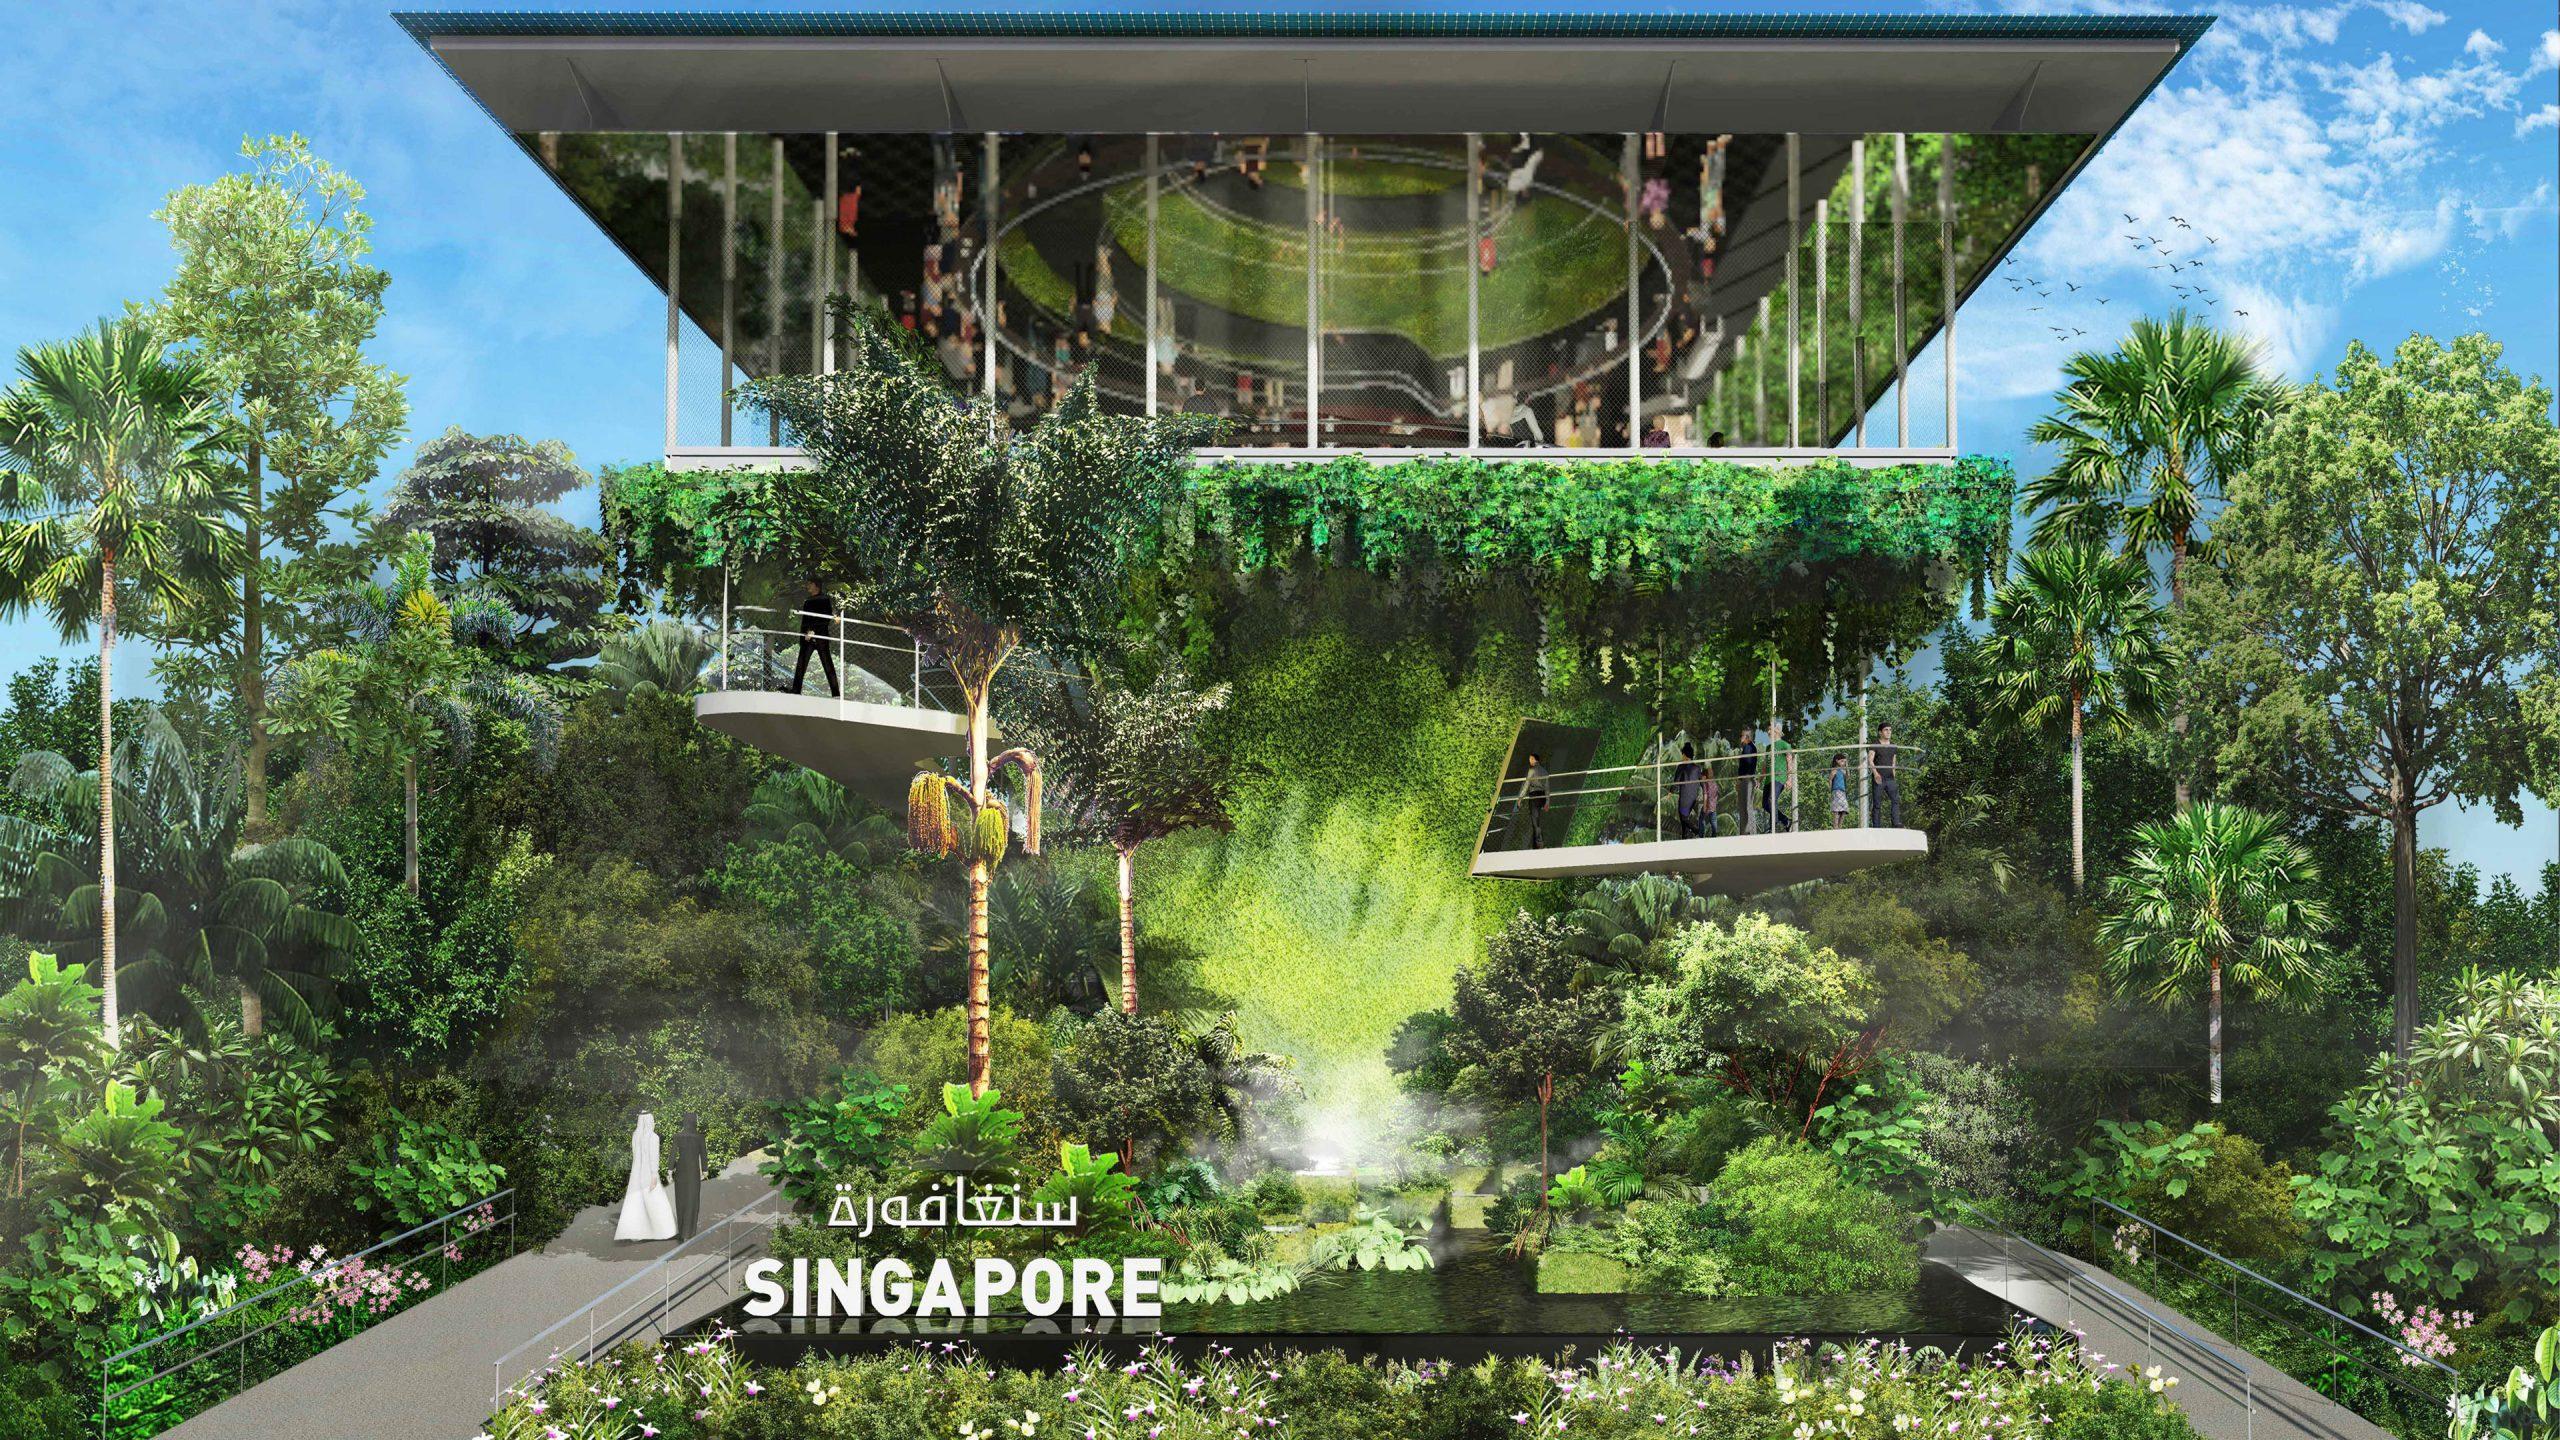 Padiglione di Singapore - credit singapore2020